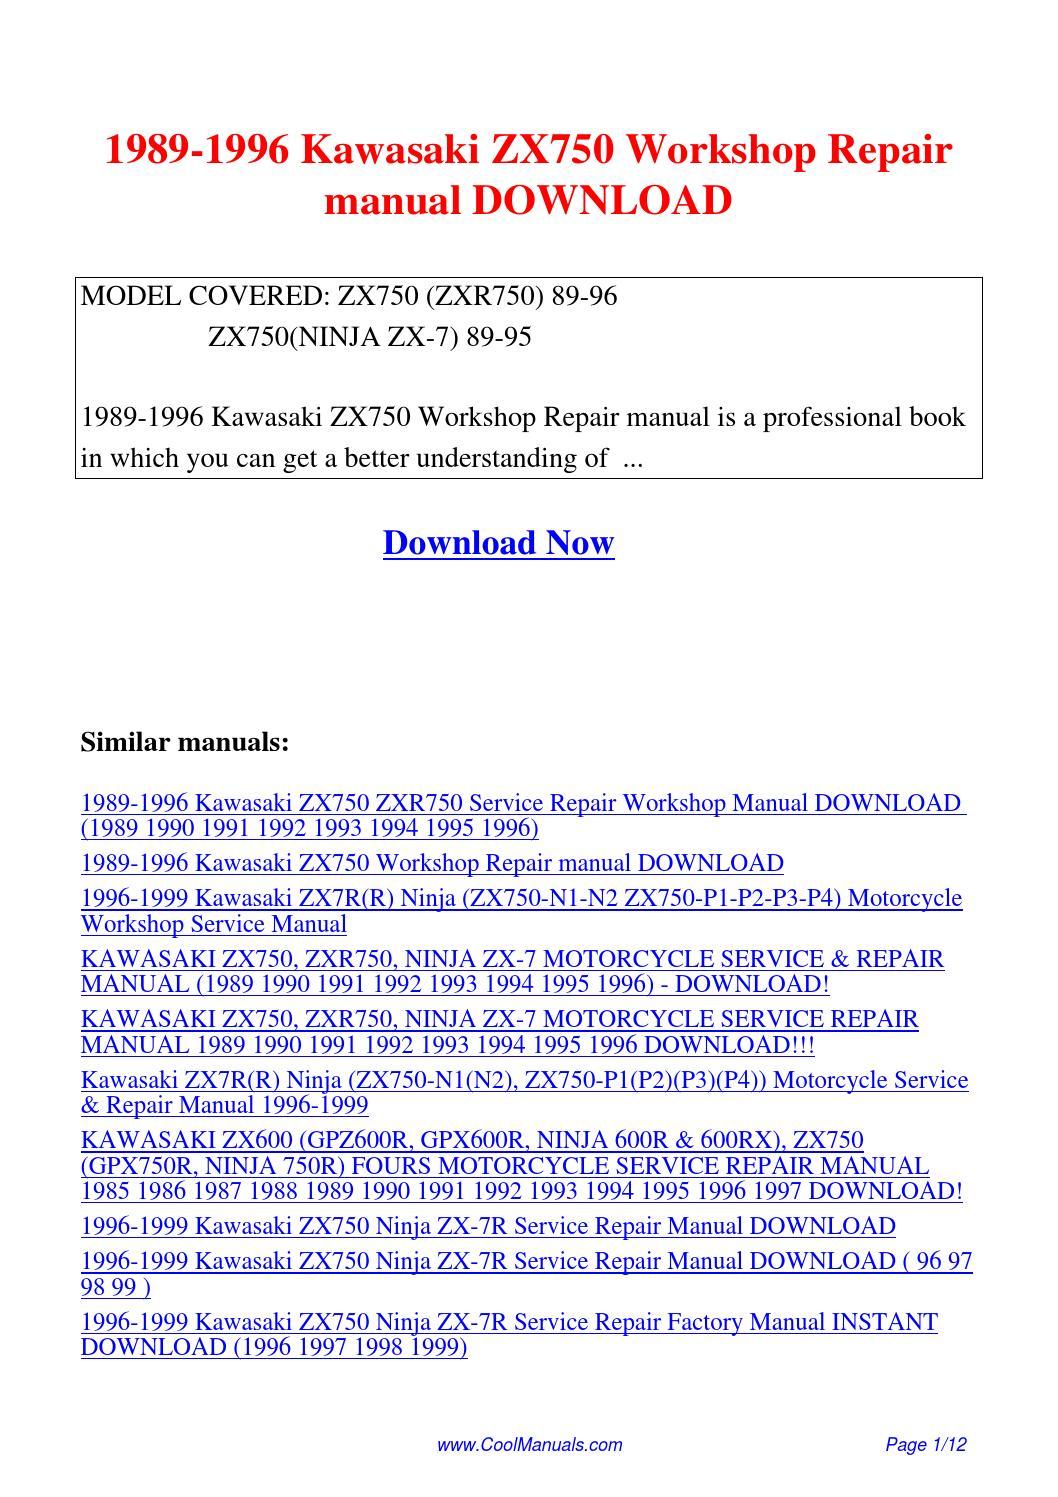 Kawasaki Zx7r Service Manual Pdf 1996 1100 Ninja Wiring Diagram Zx 7rr 7r Motorcycle